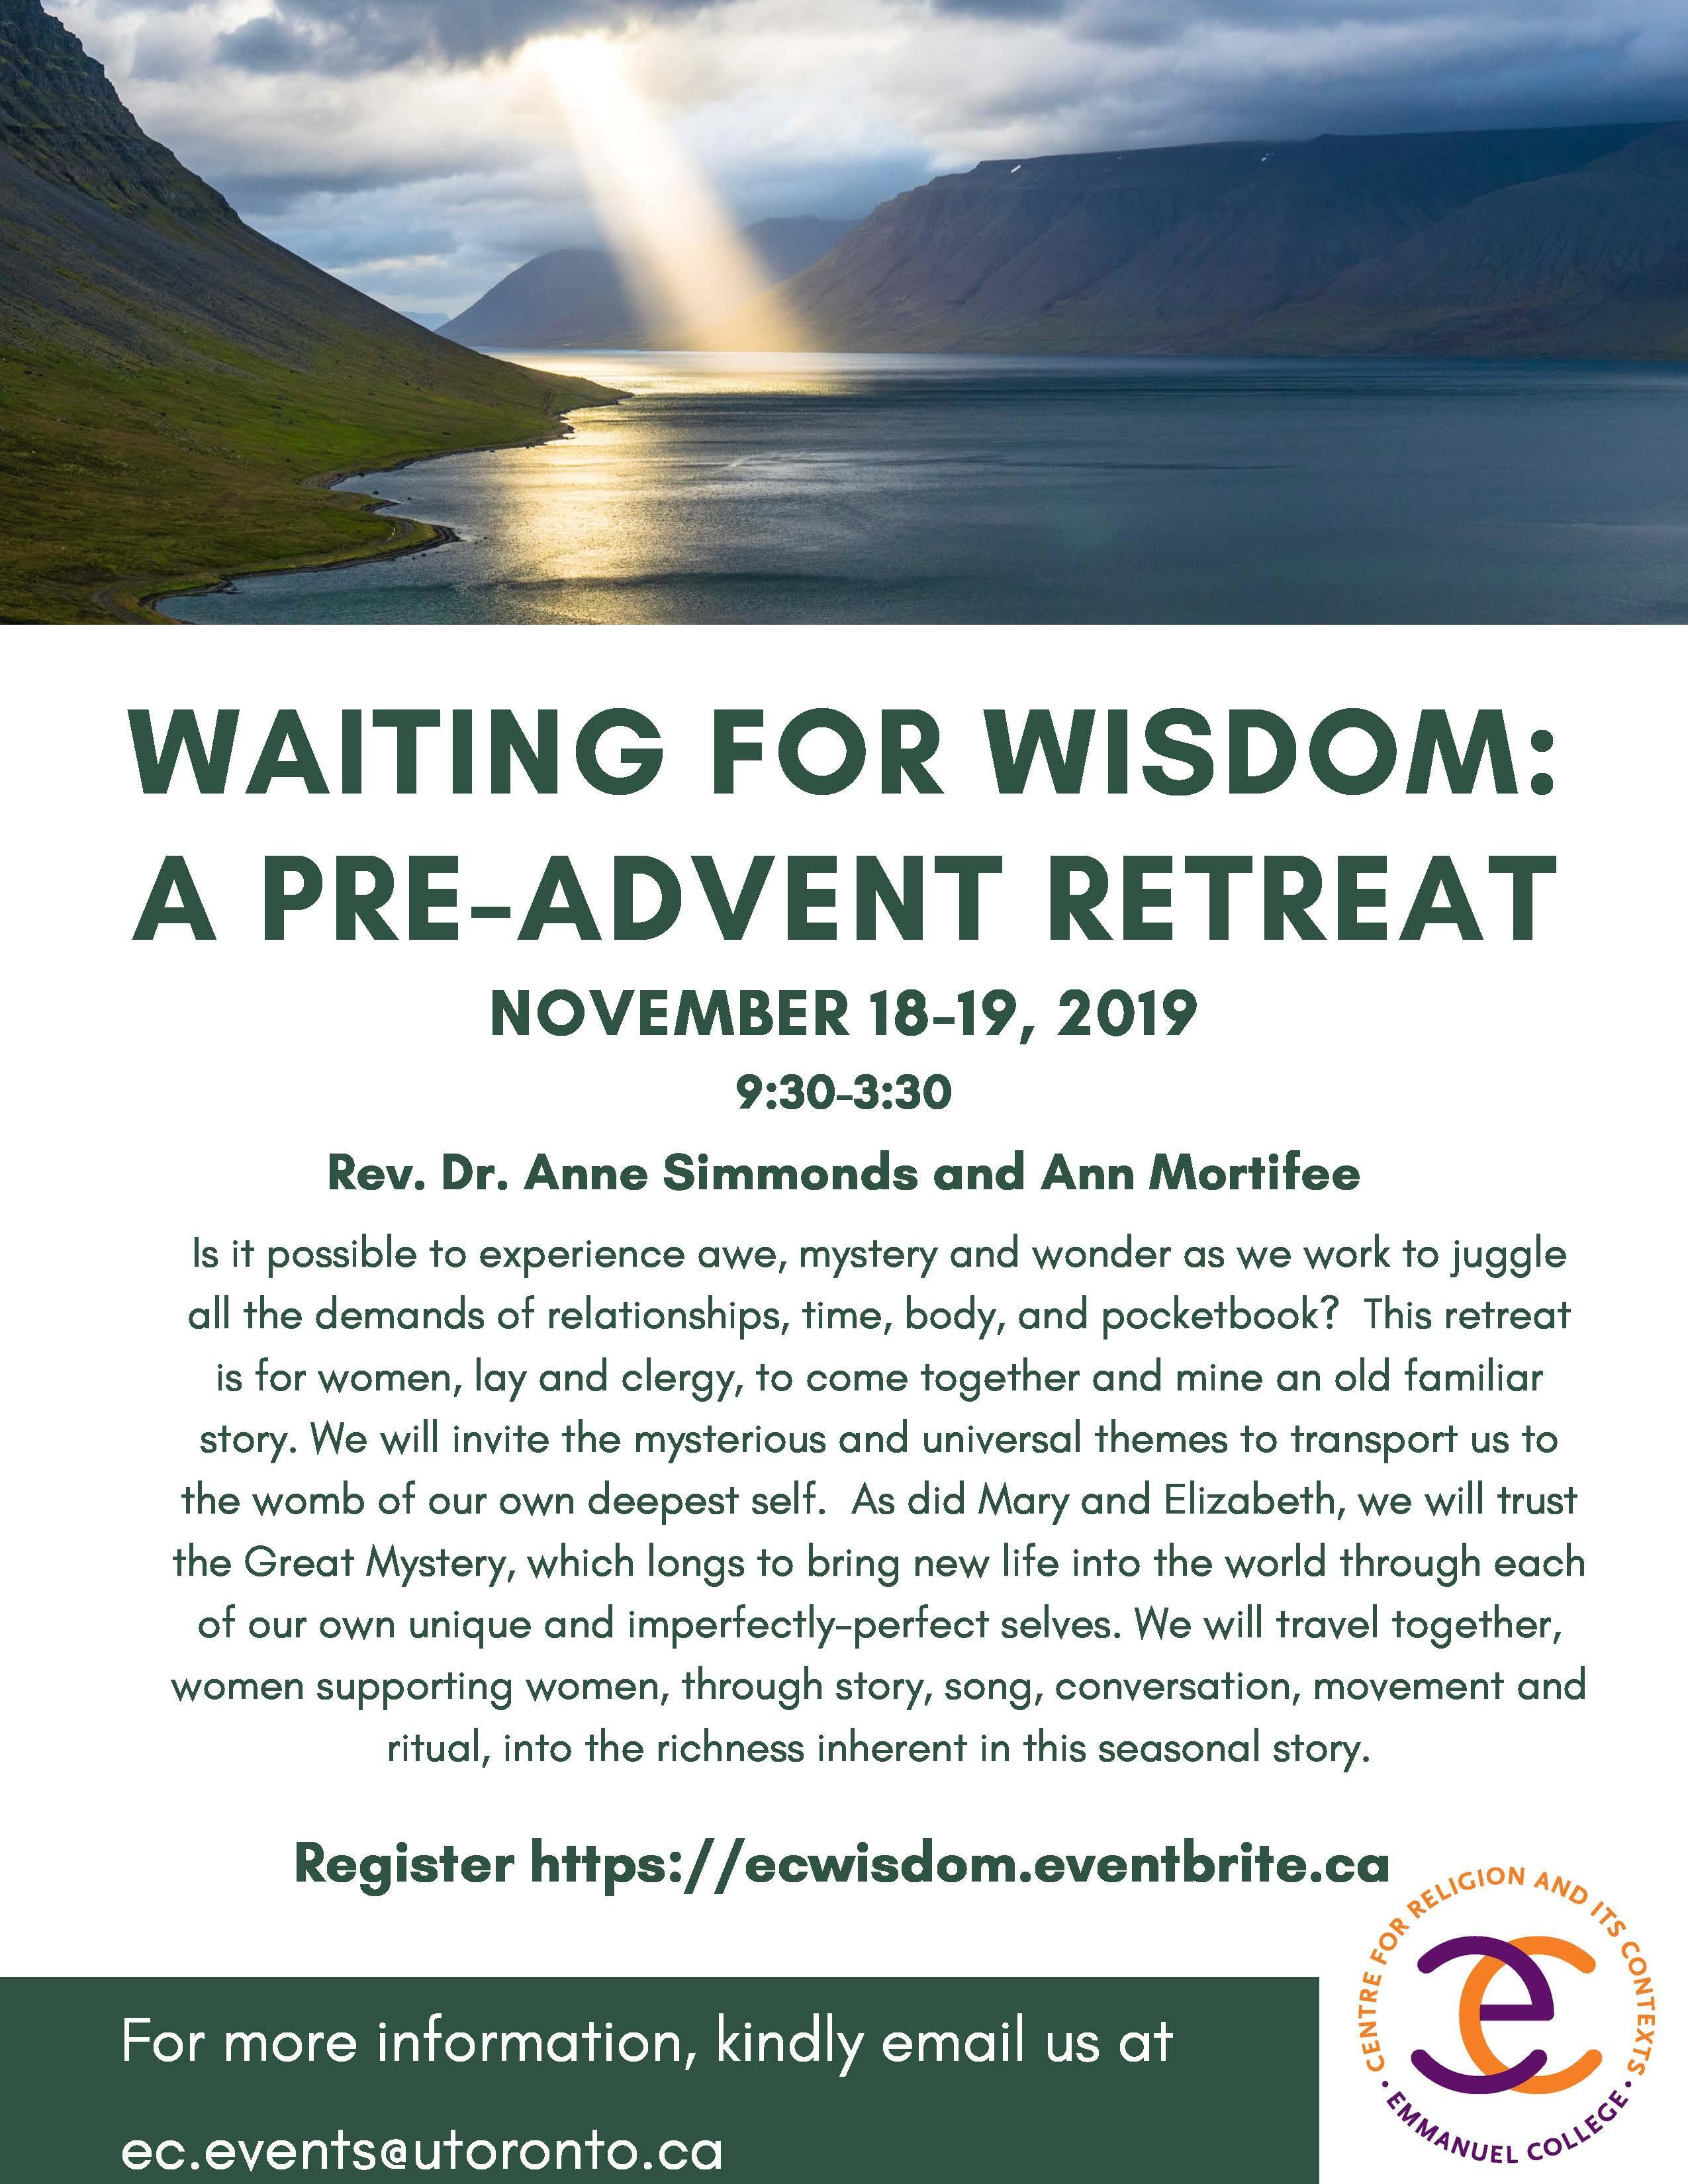 A Two-Day Pre-Advent Retreat